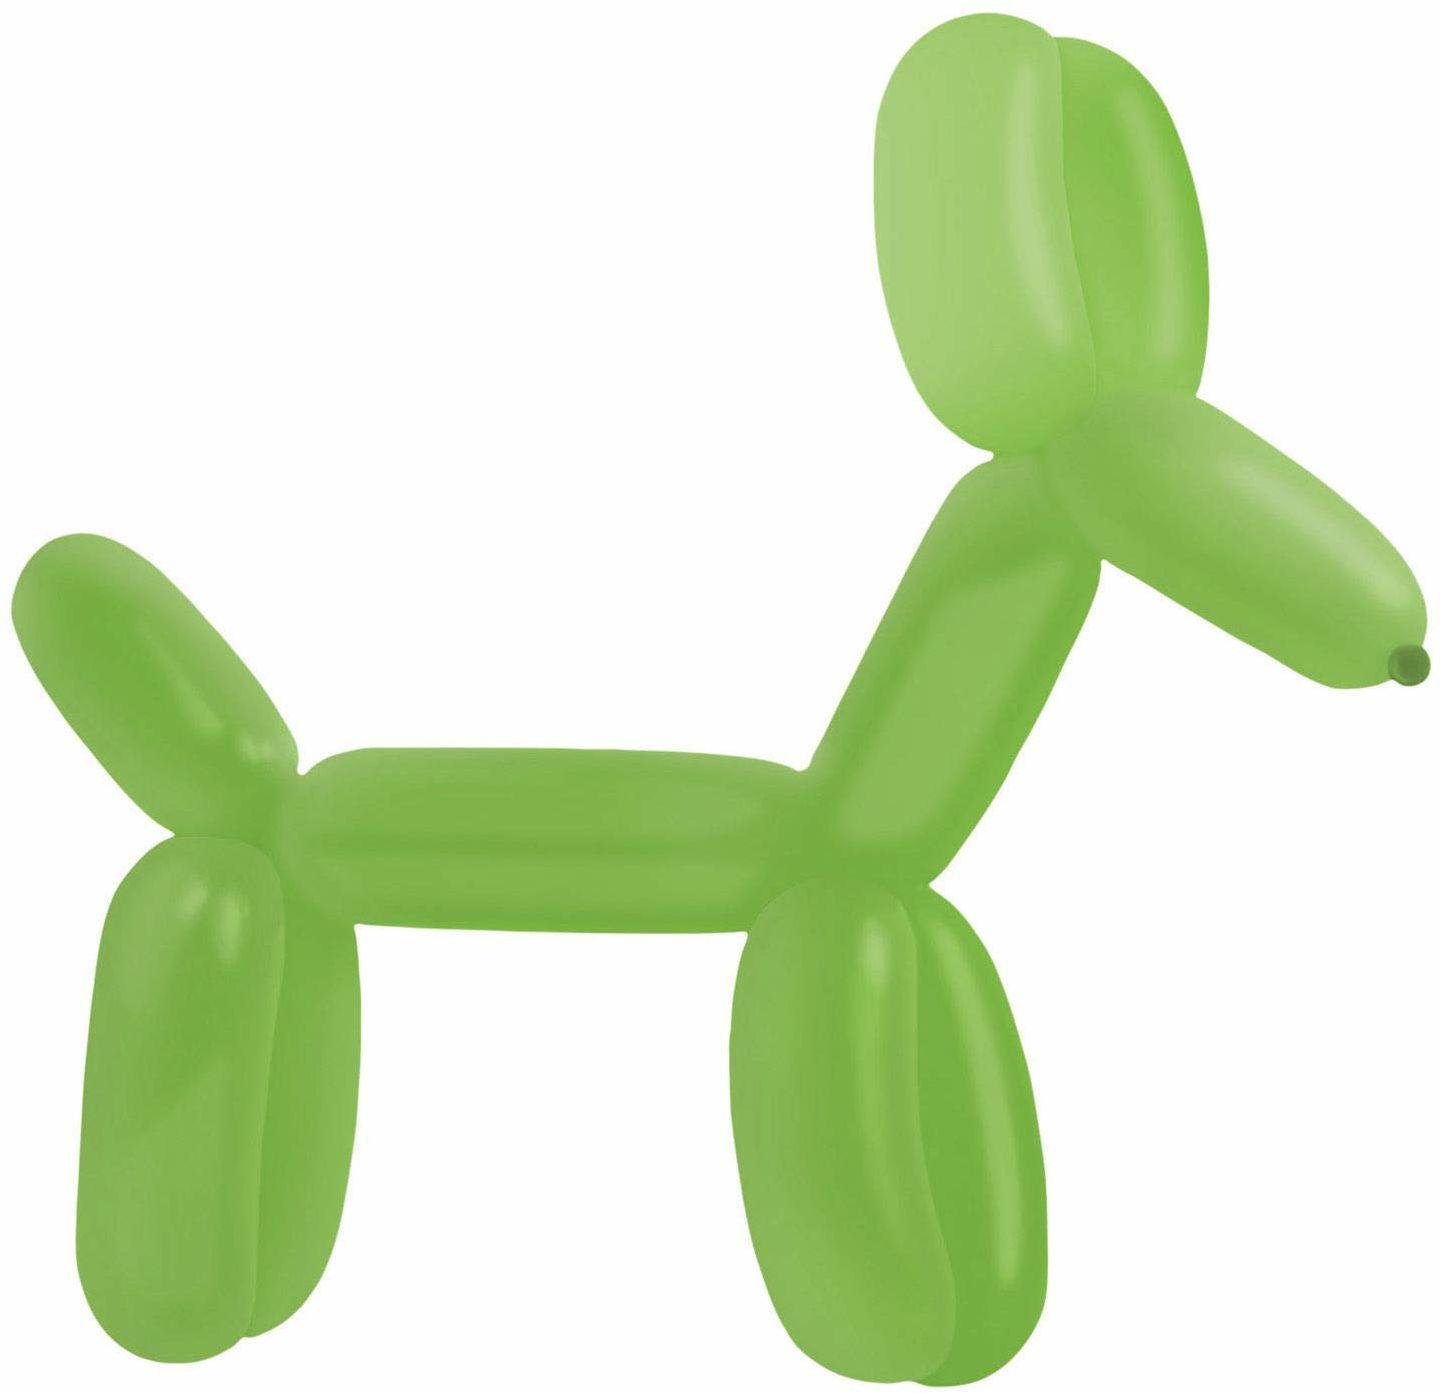 amscan 9905532 100 balony lateksowe do modelowania standard E260, zielone